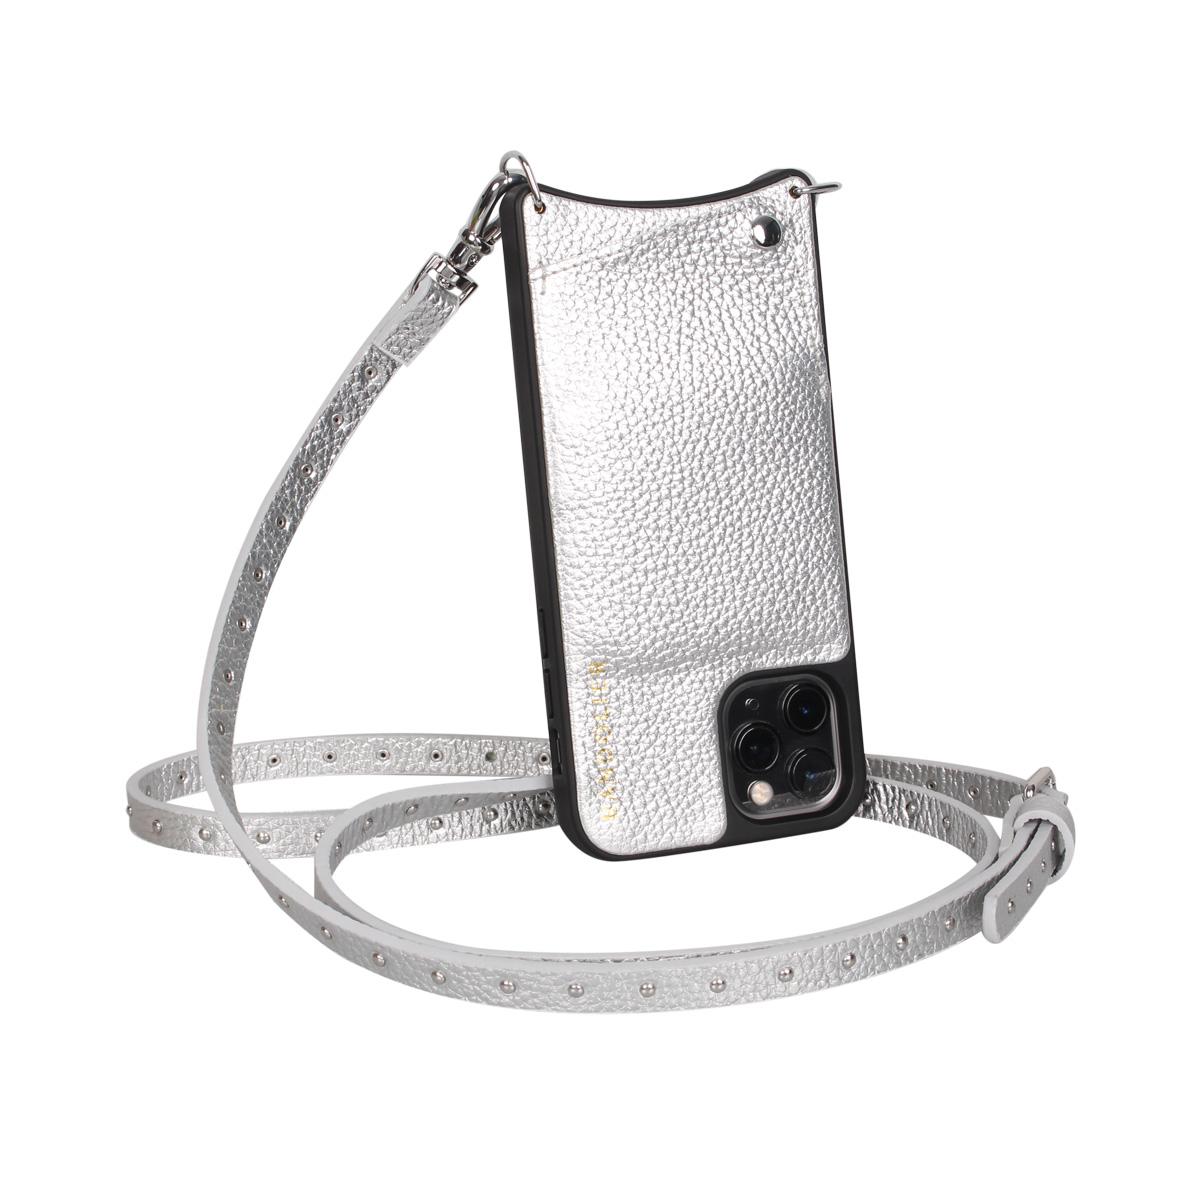 BANDOLIER NICOLE RICH SILVER バンドリヤー iPhone11 ケース スマホ 携帯 ショルダー アイフォン メンズ レディース レザー シルバー 10NIC